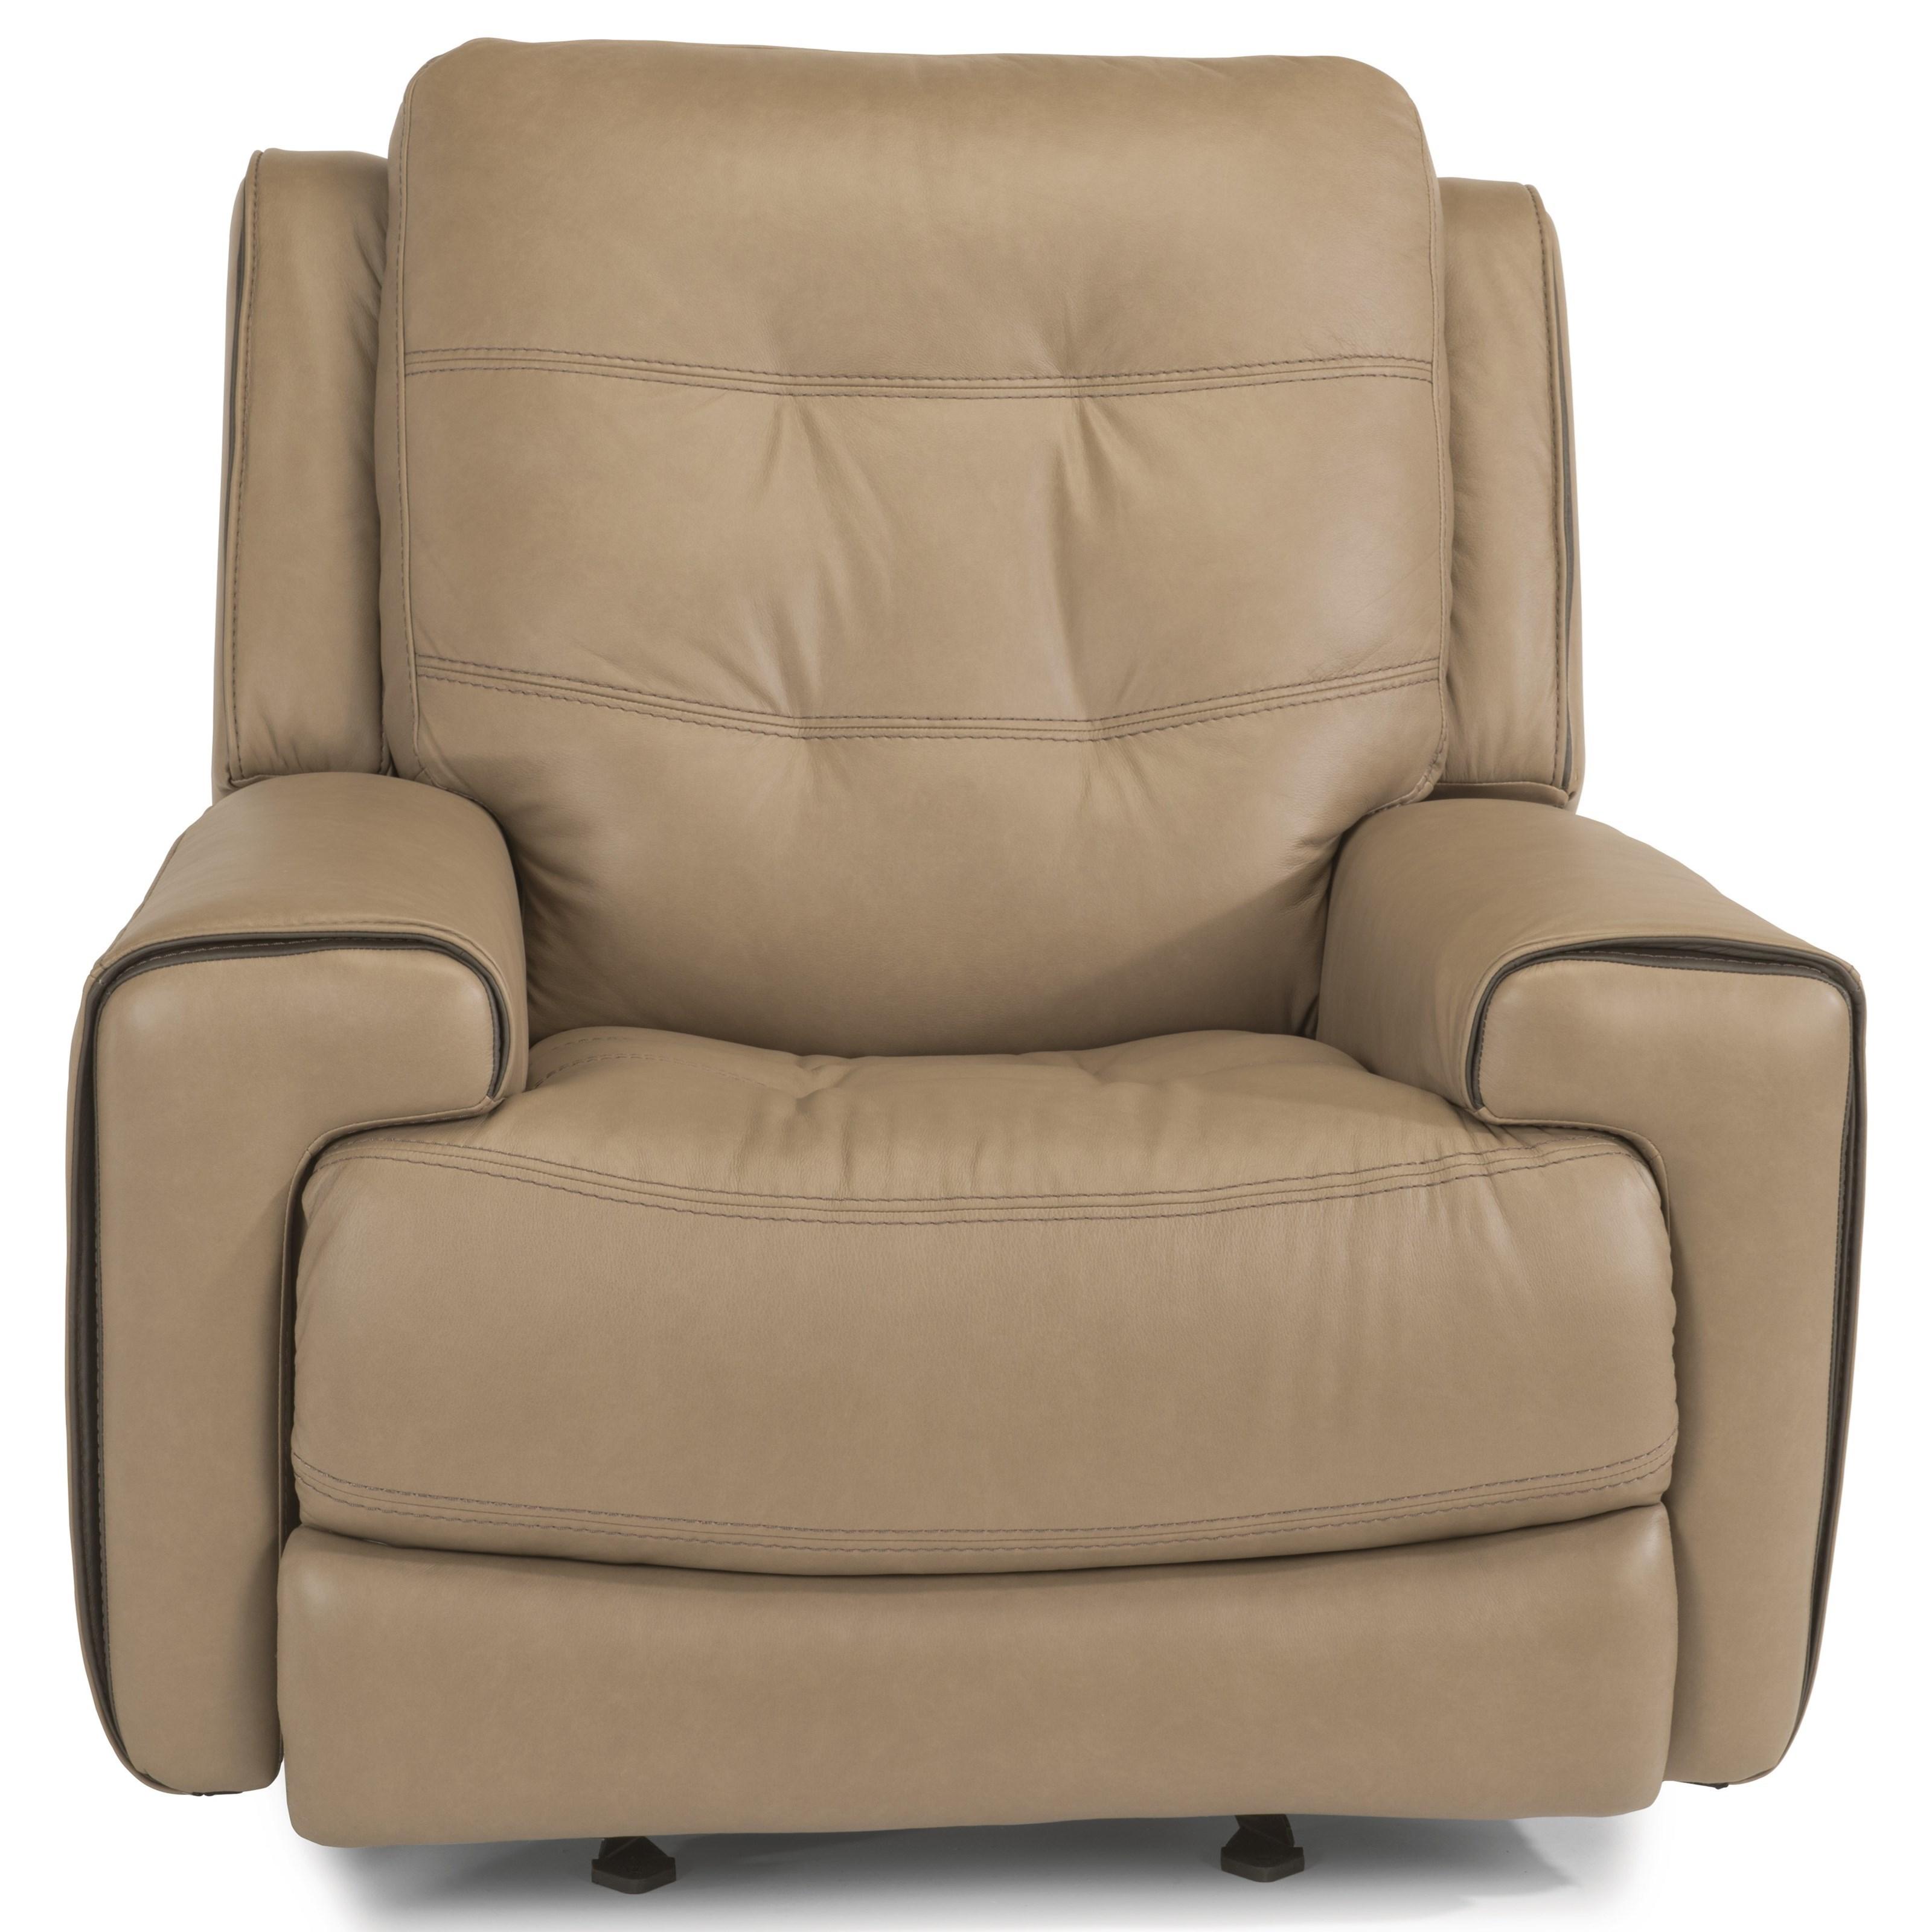 Latitudes-Wicklow PWR Gliding Leather Recliner w/PWR Headrest by Flexsteel at Walker's Furniture